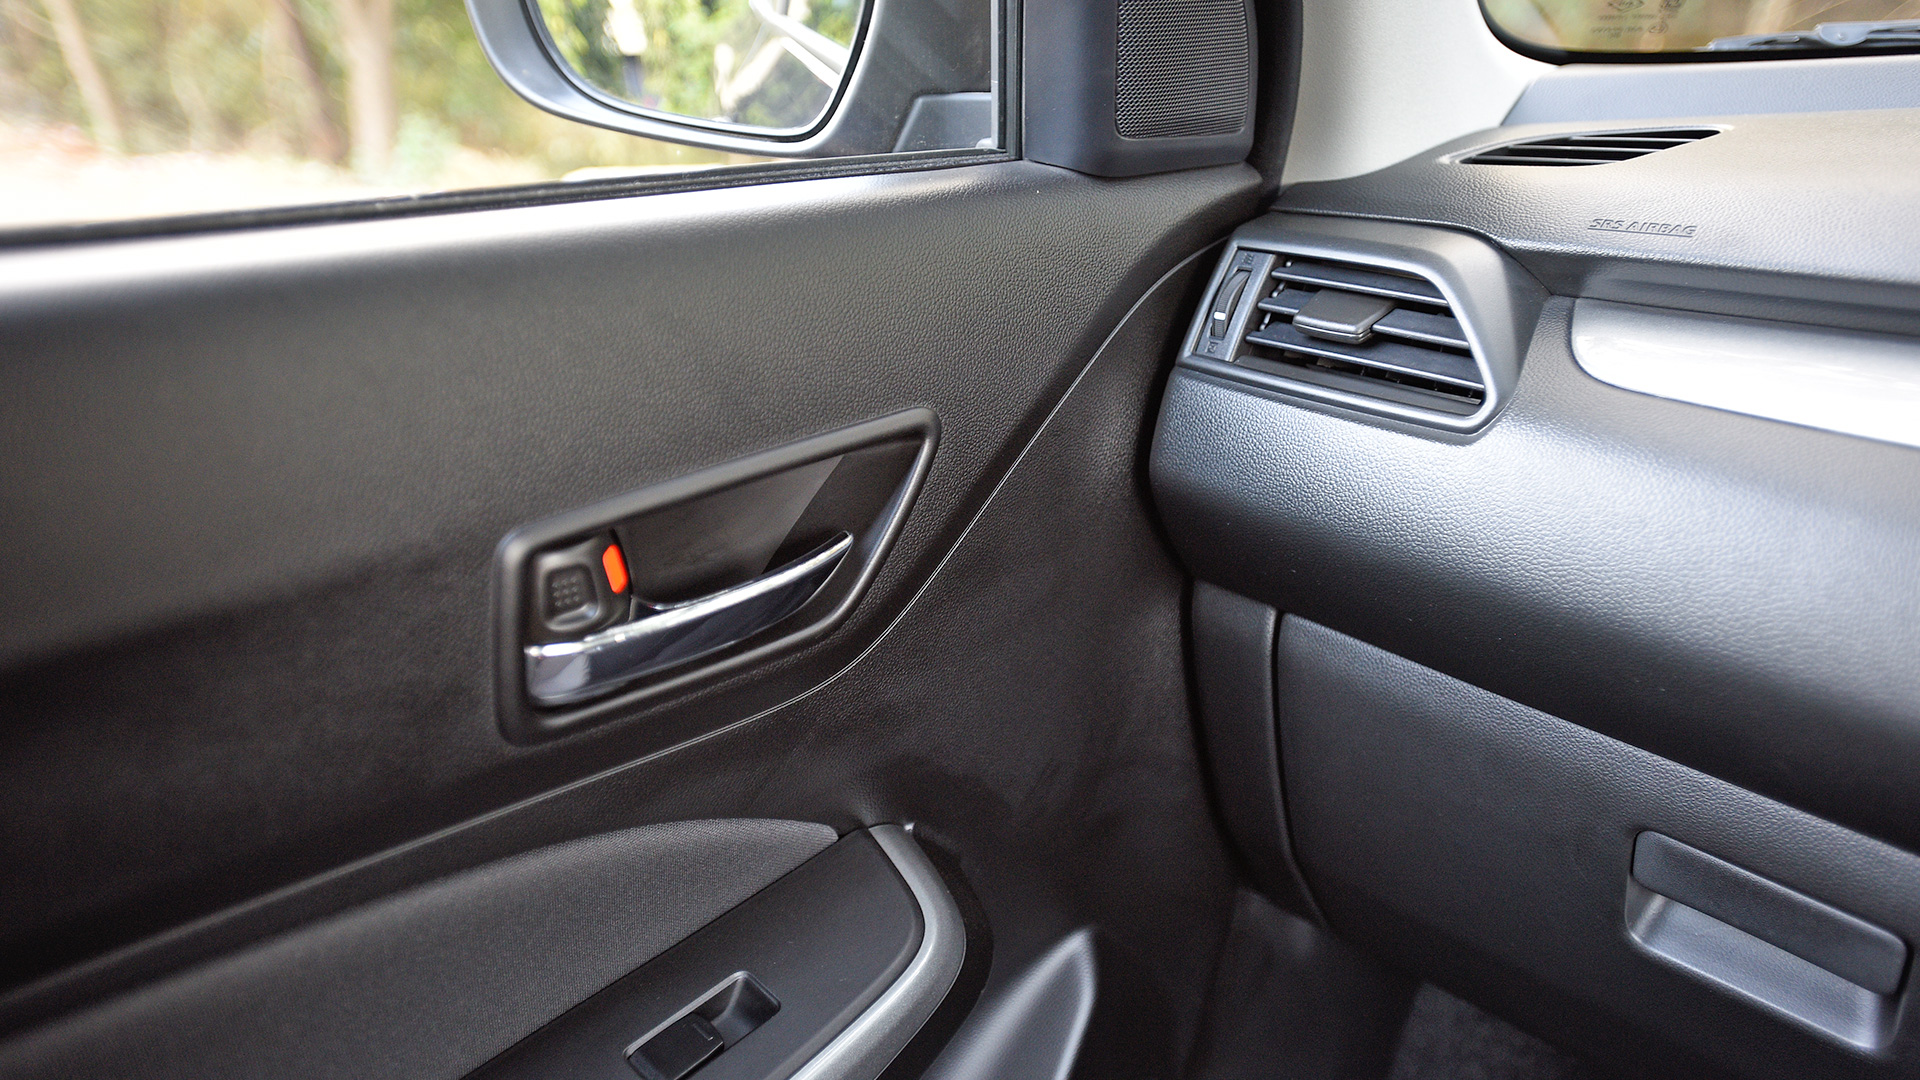 Maruti Suzuki Swift 2018 Zdi Interior Car Photos Overdrive